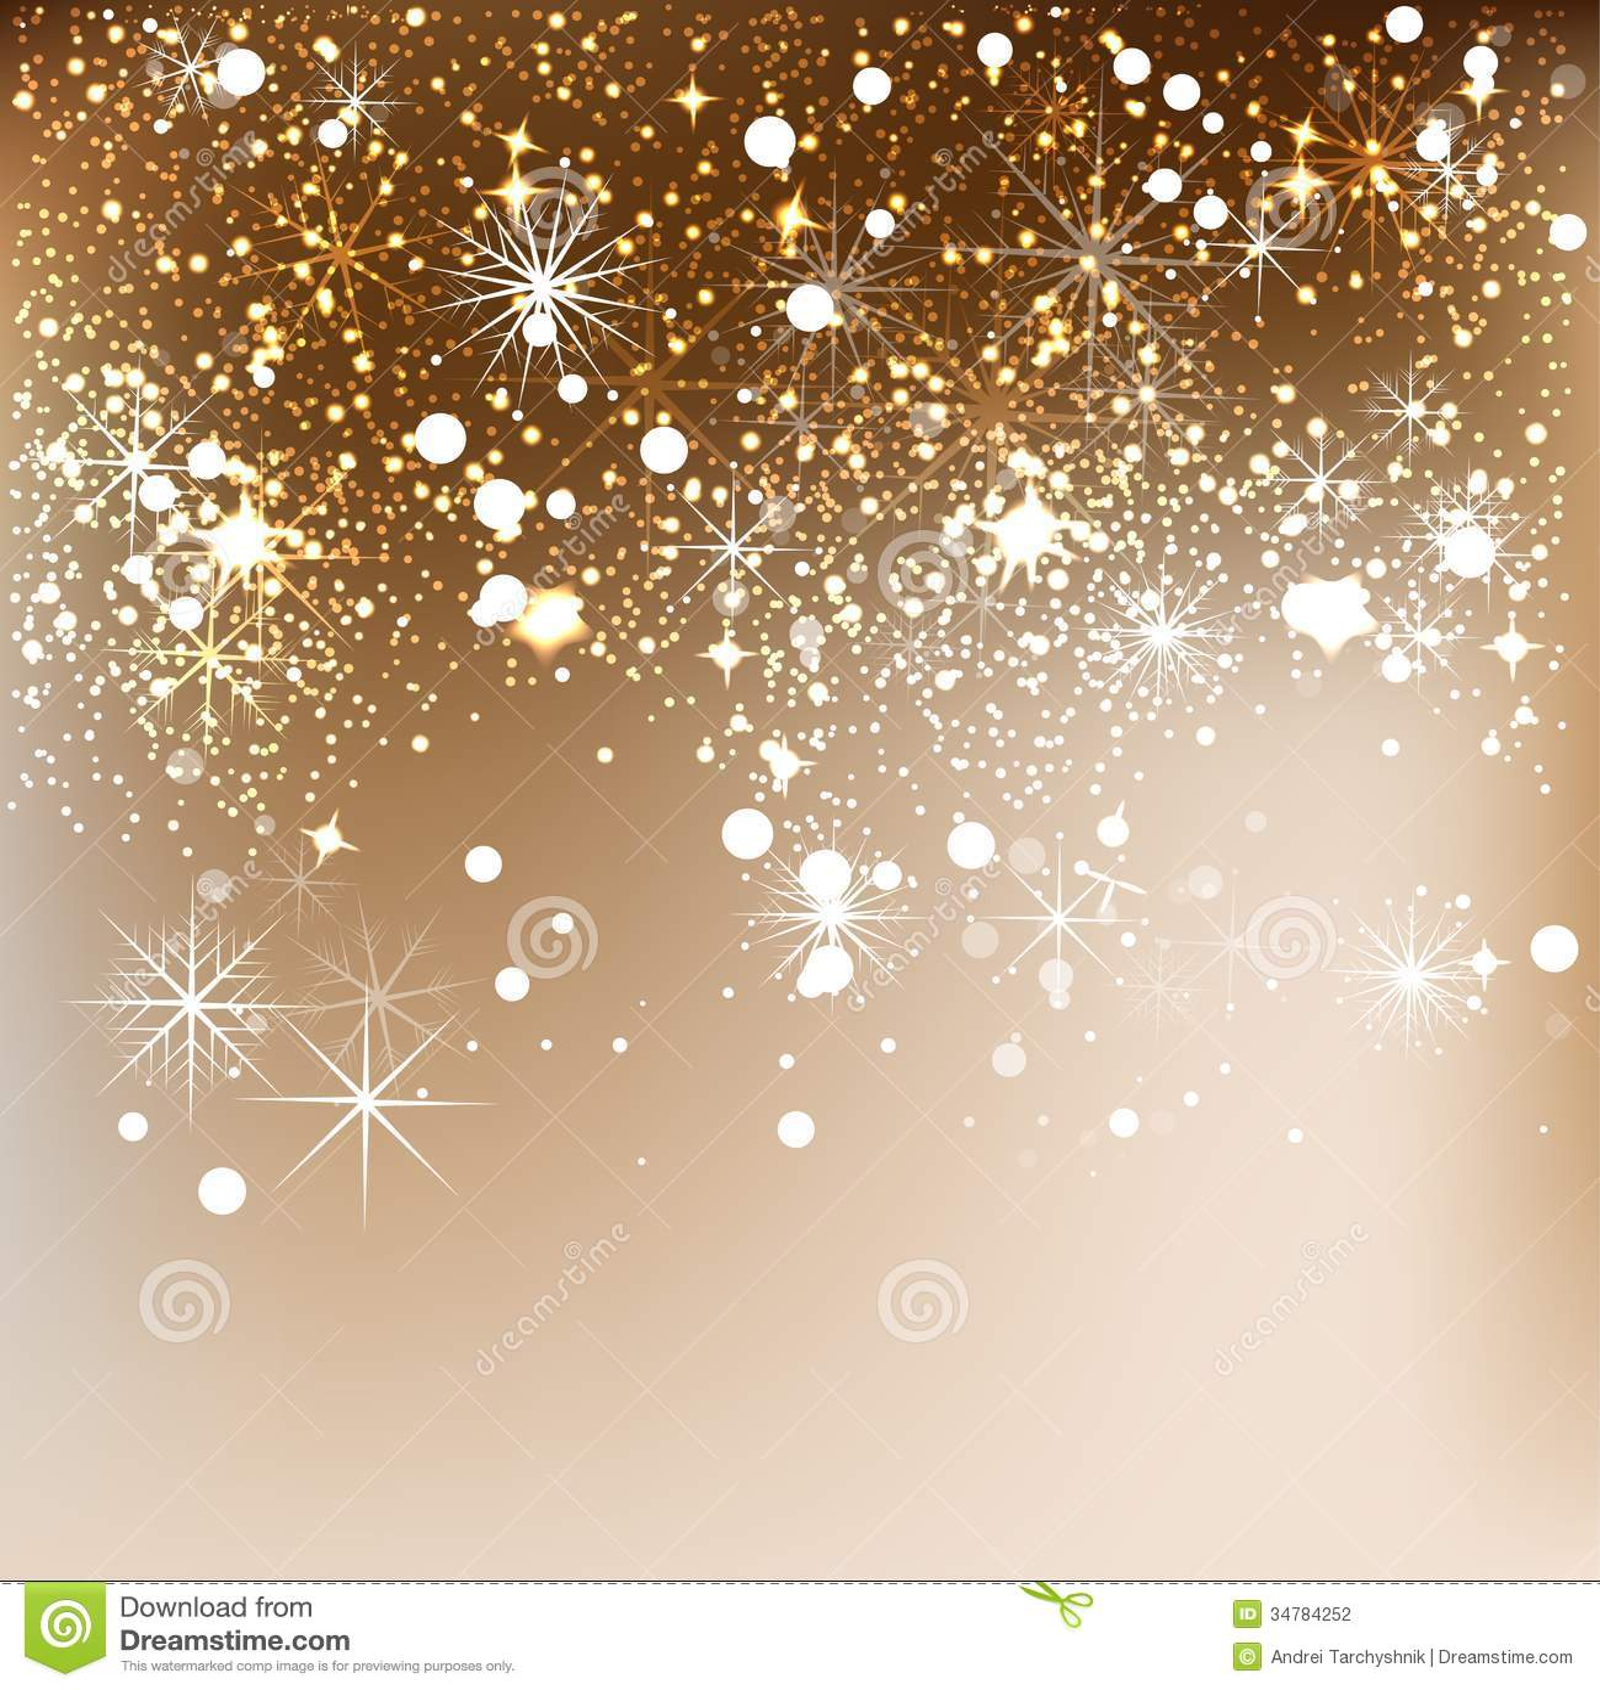 Elegant Christmas Background Hd.Elegant Christmas Background With Snowflakes Stock